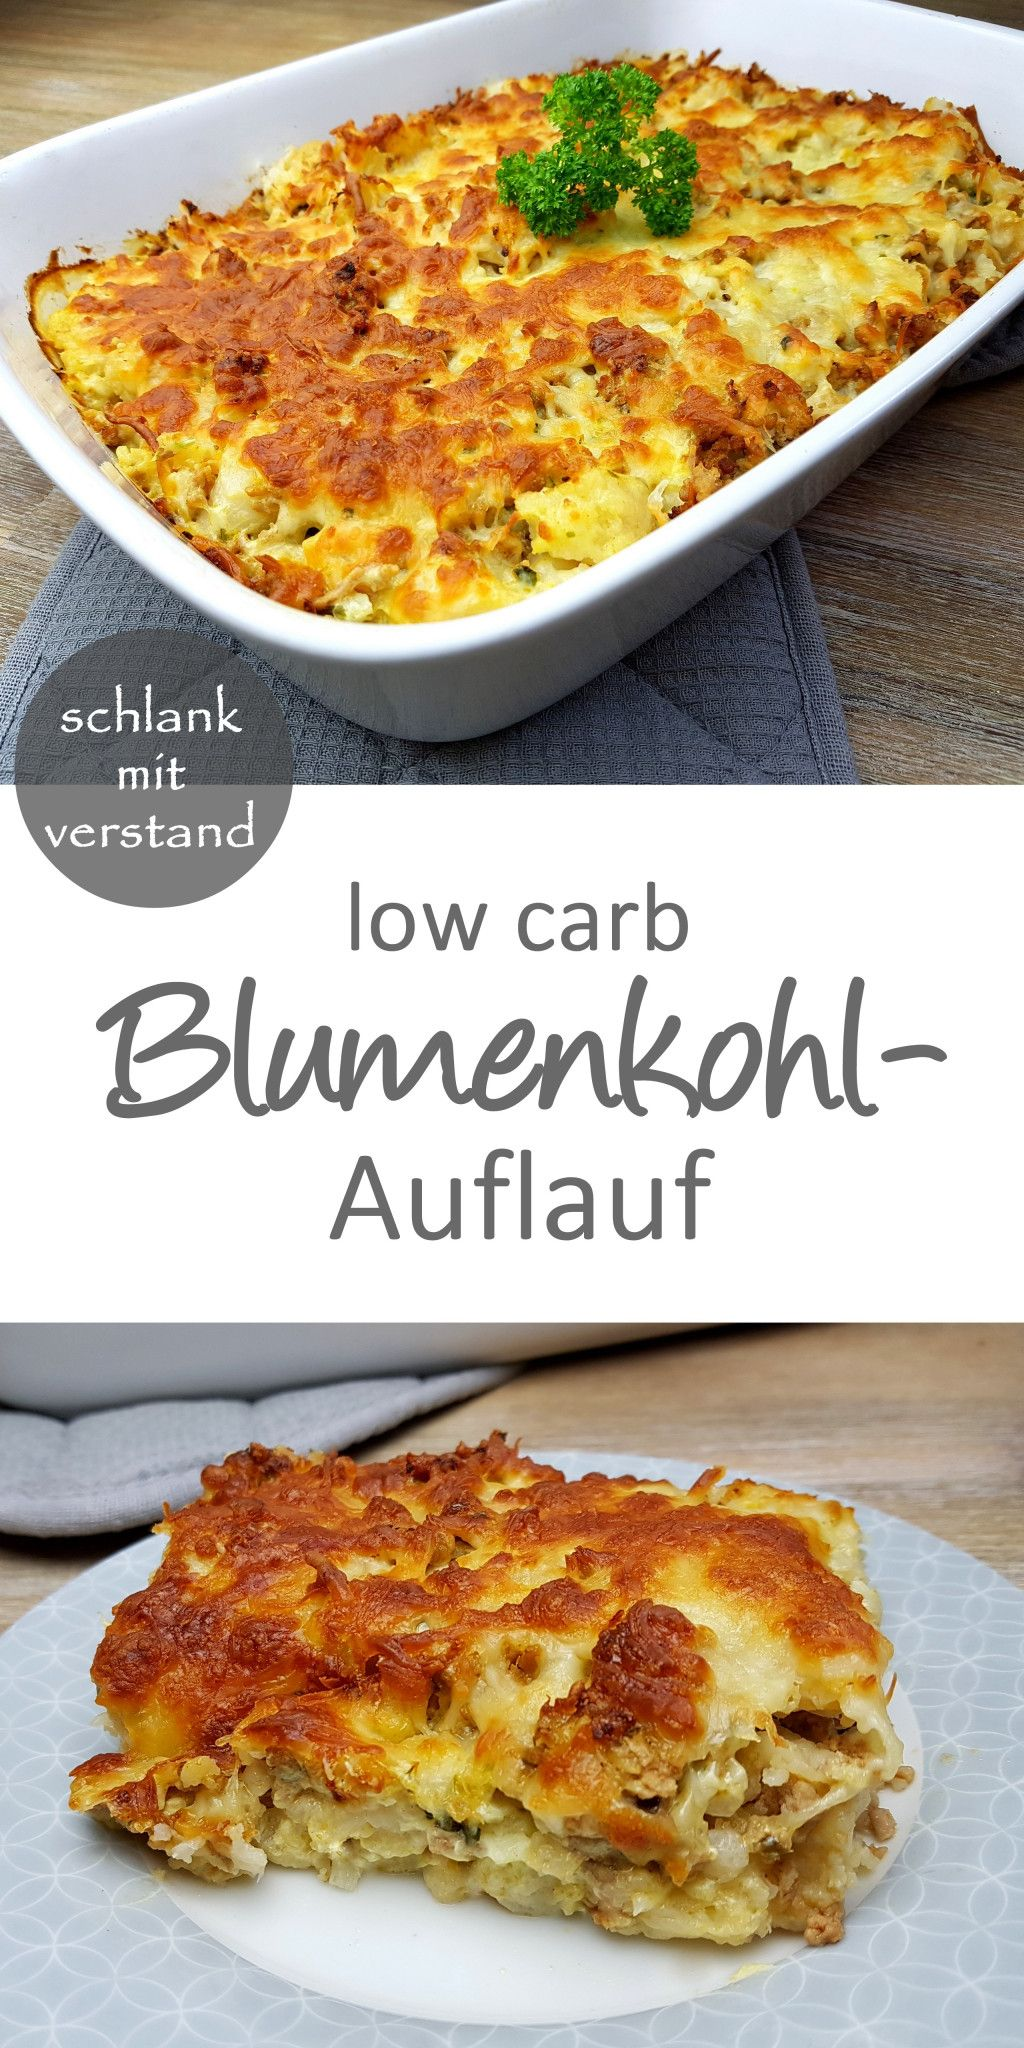 Photo of low carb cauliflower casserole